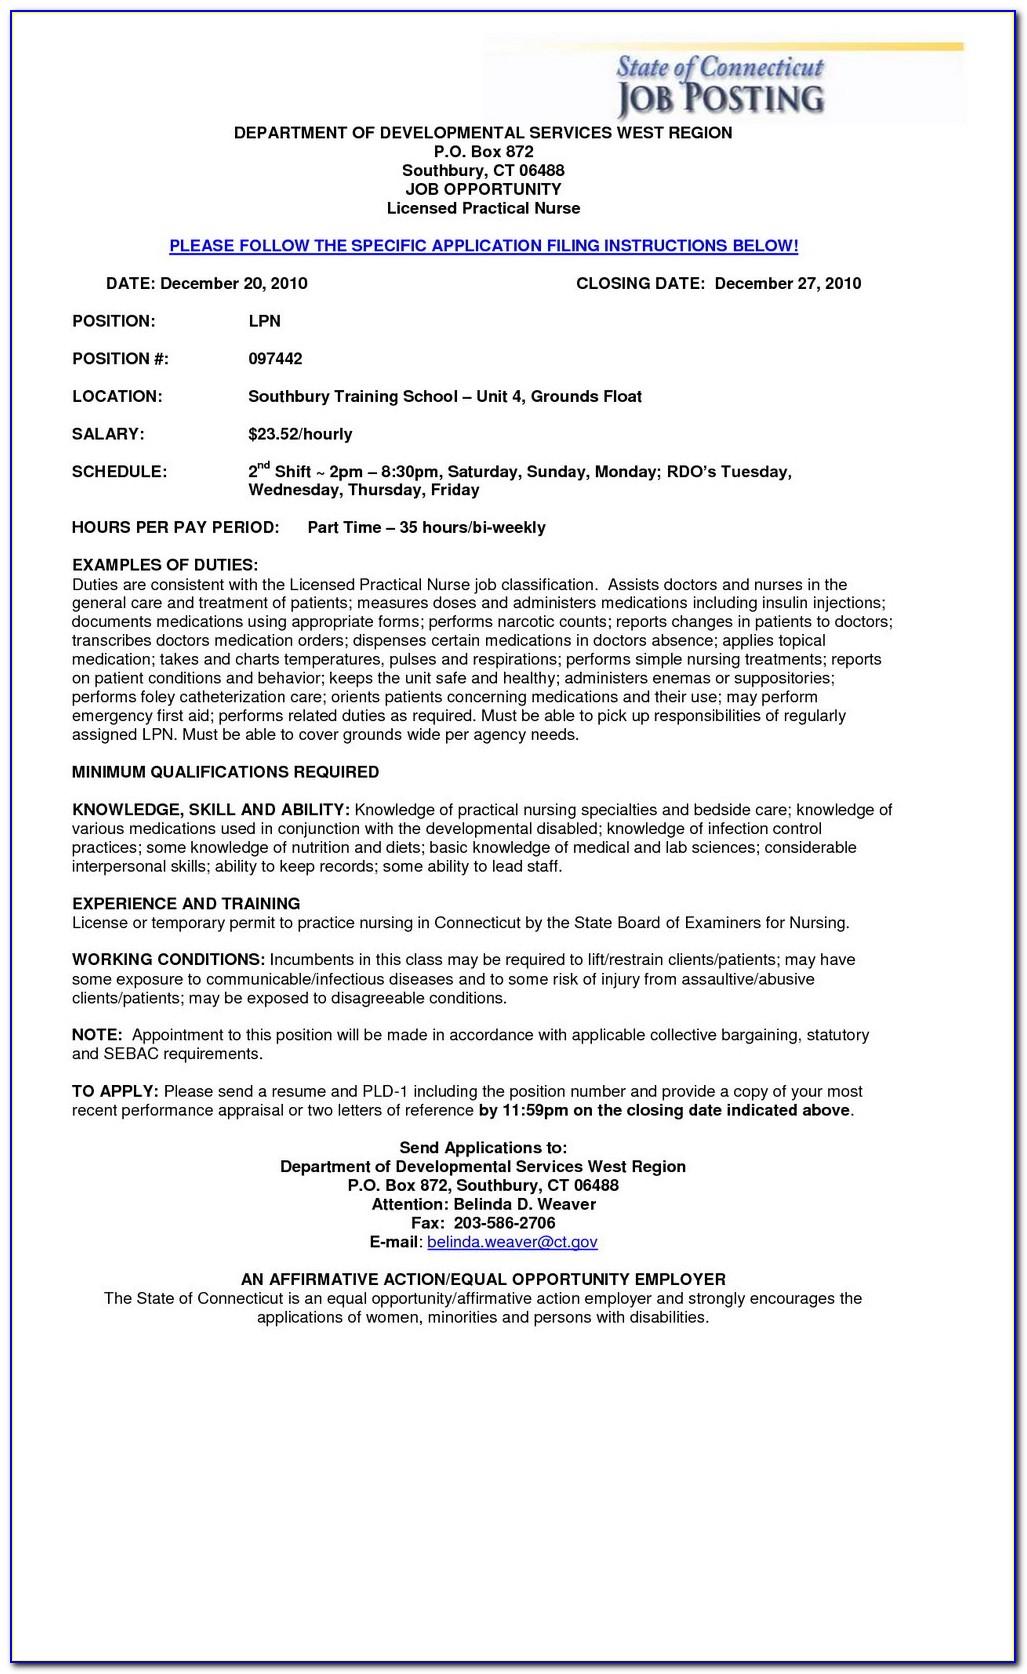 Sample Resume For Rn Position